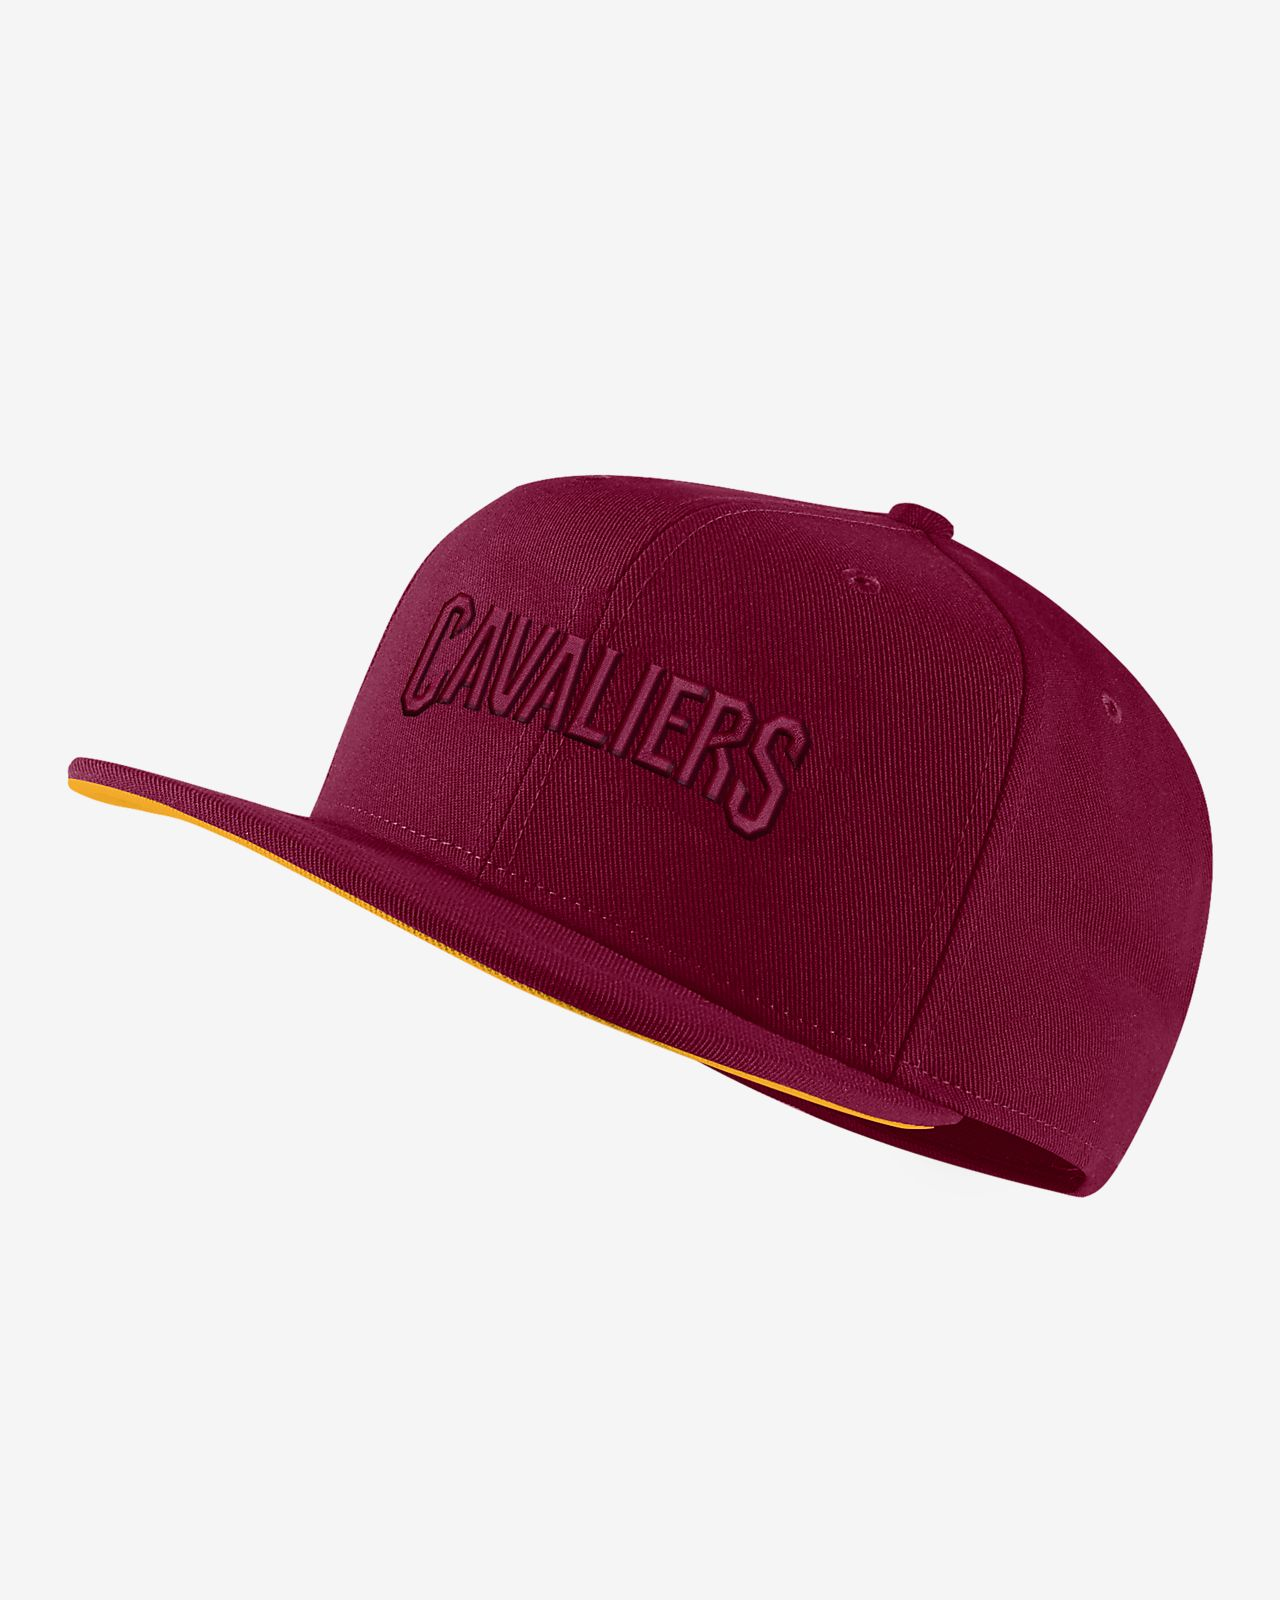 Cleveland Cavaliers Nike AeroBill NBA Hat